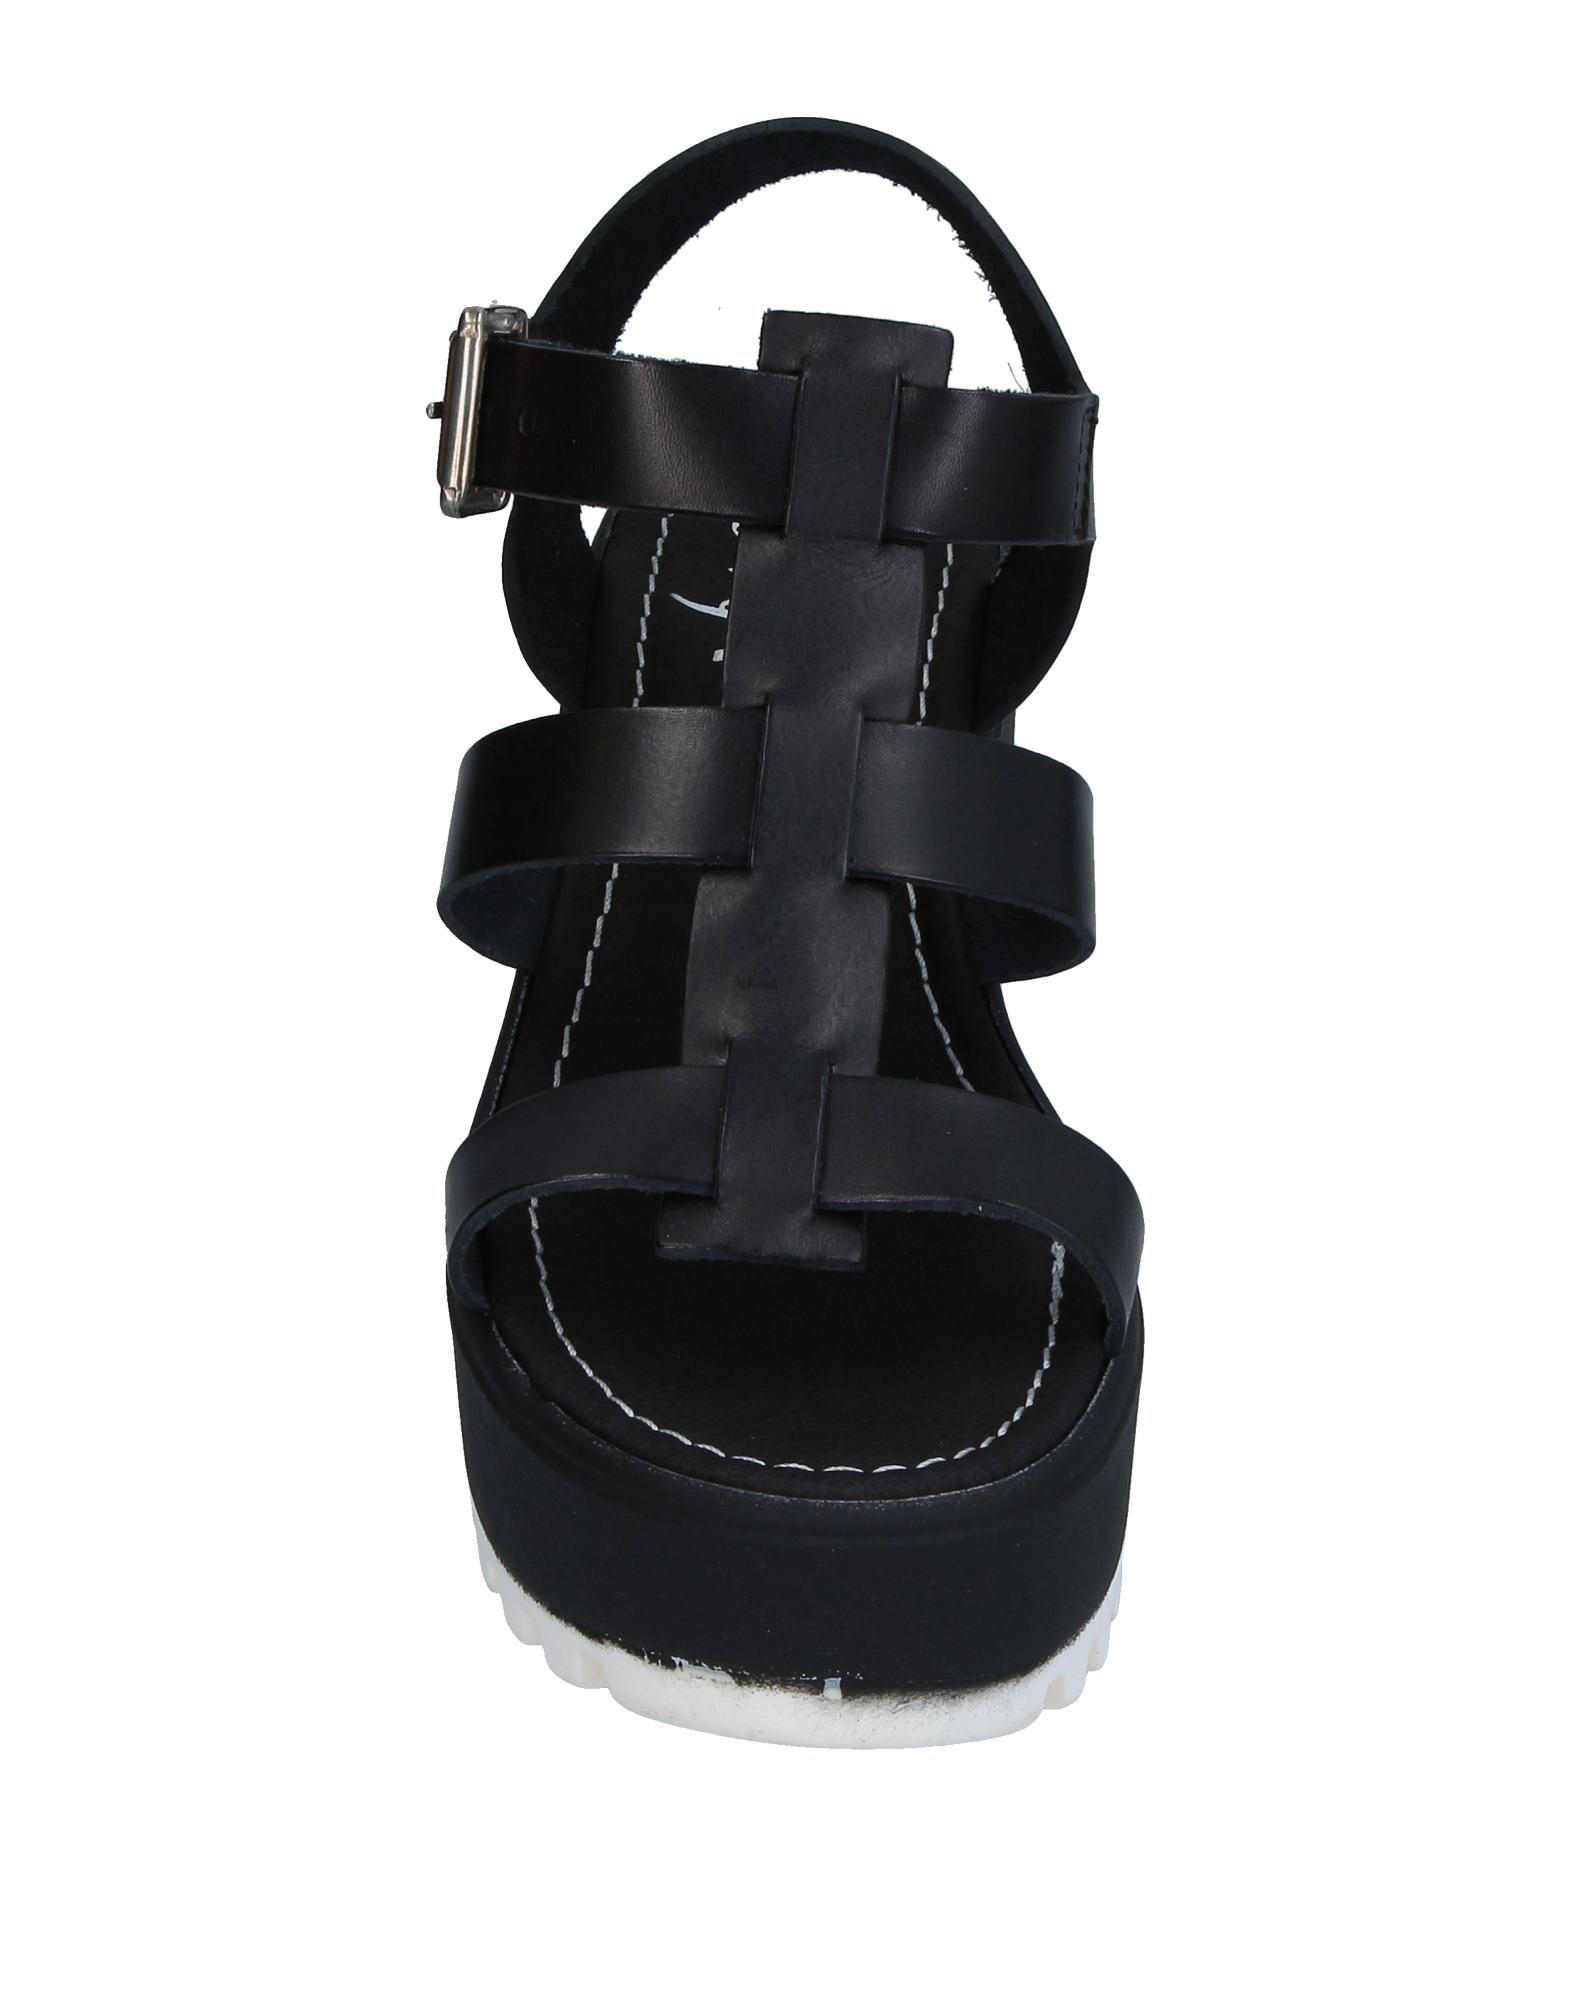 ovye & # 39; par cristina lucchi lucchi lucchi sandales - femmes ovye & # 39; par cristina lucchi sandales en ligne sur canada 4429e0